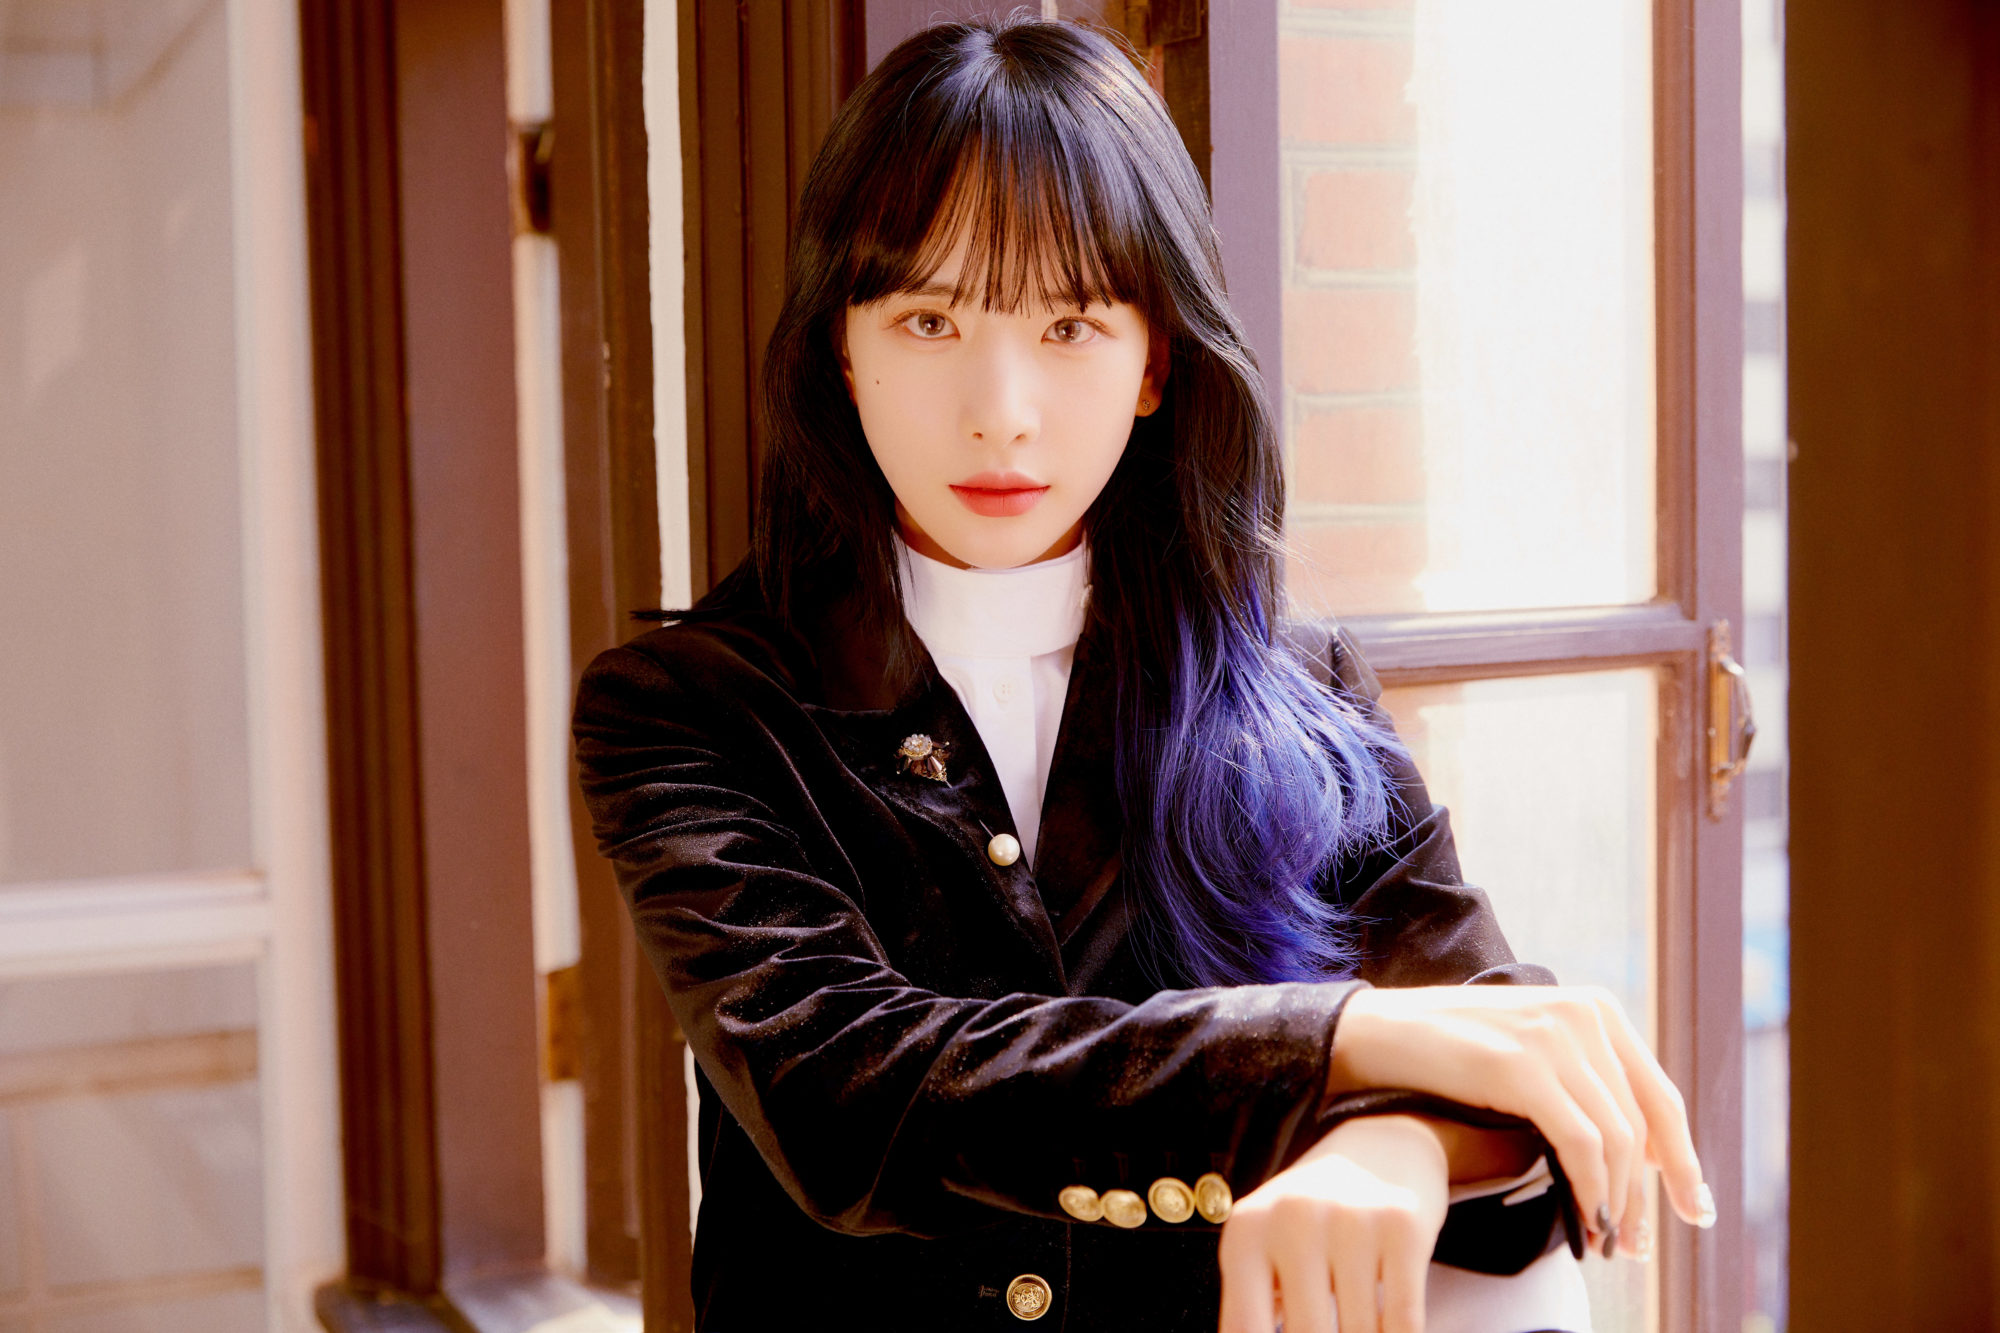 WJSN Seola As You Wish Concept